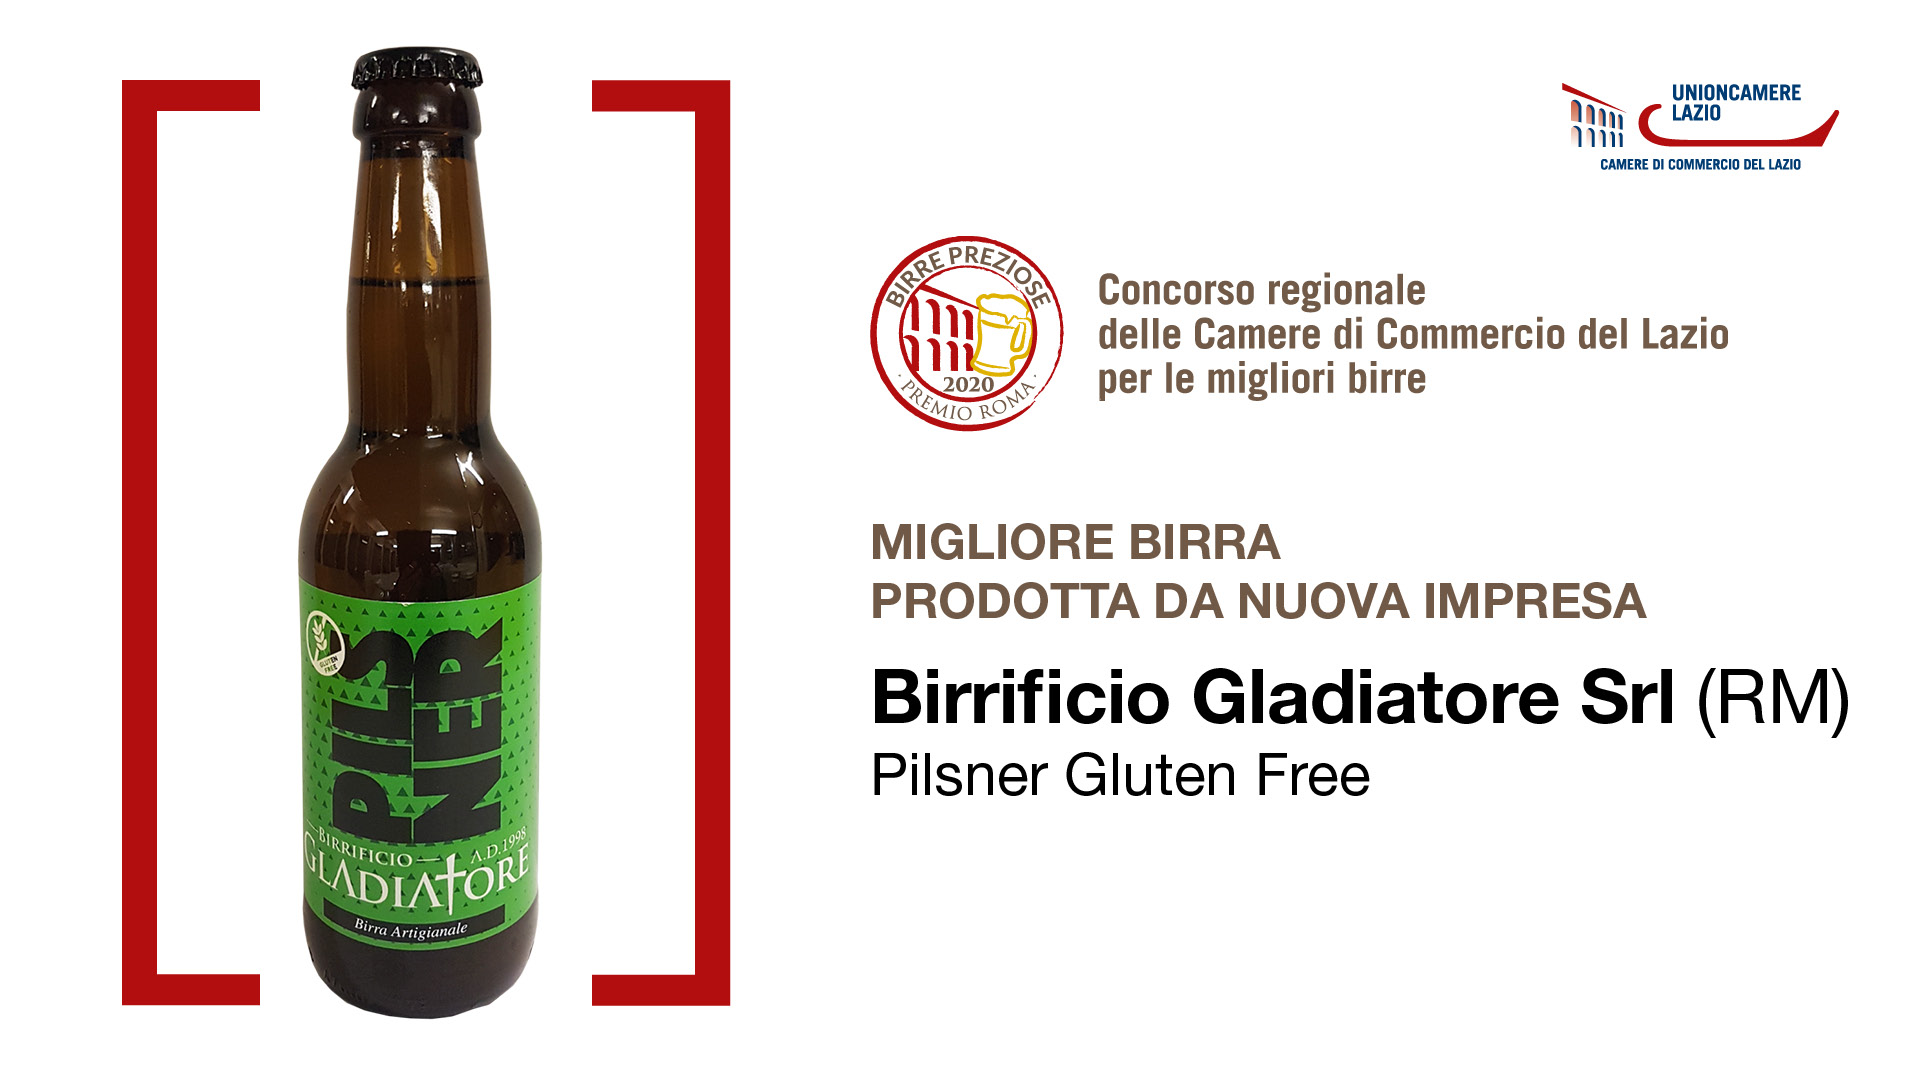 Birrificio Gladiatore Srl (RM)